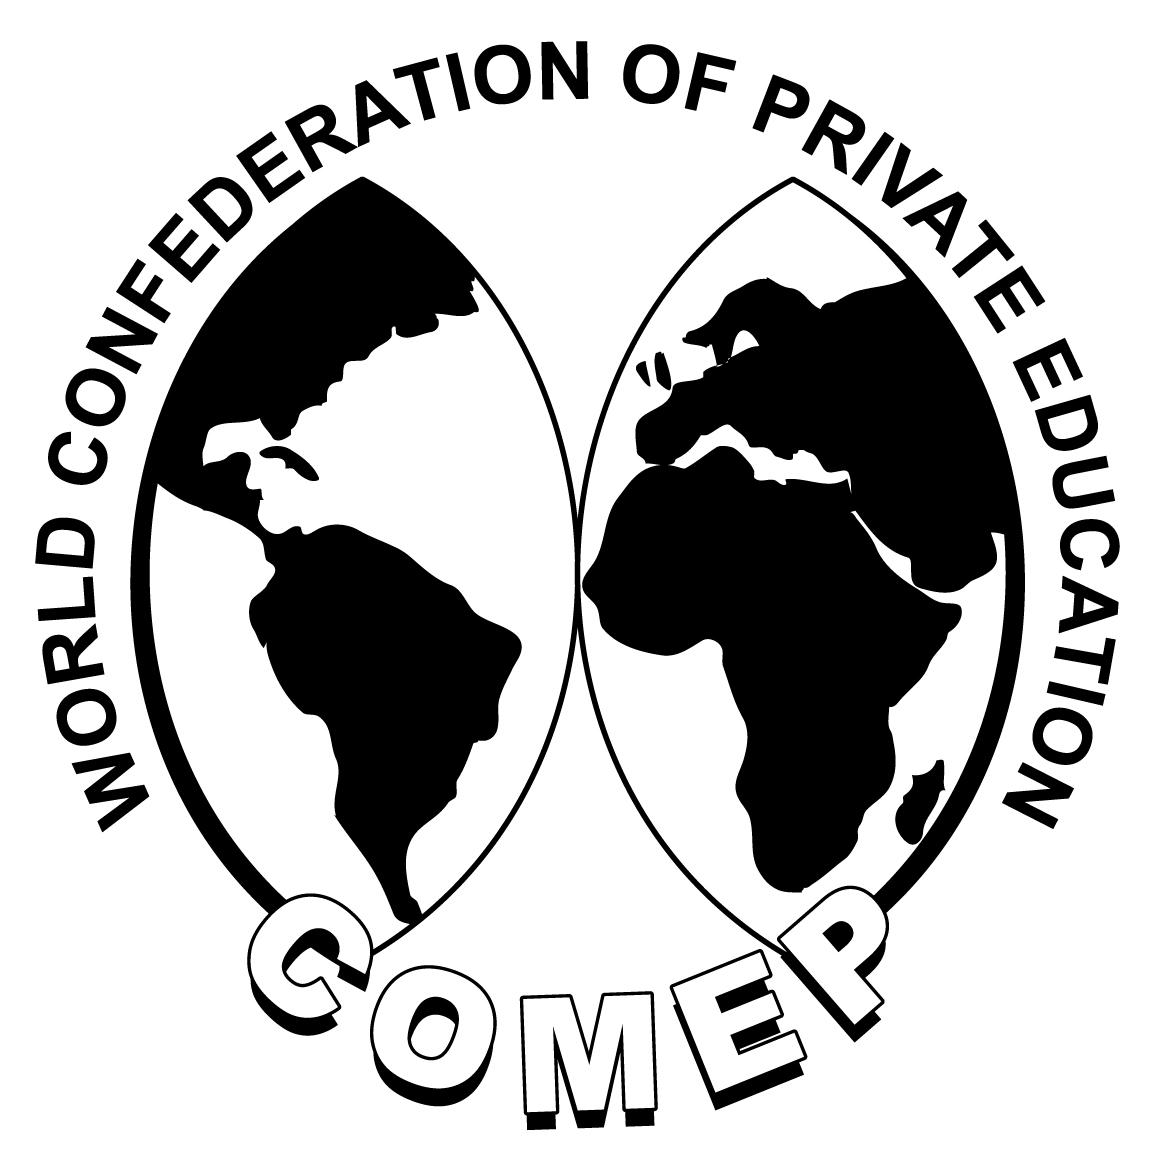 logo for Confederación Mundial de Educación